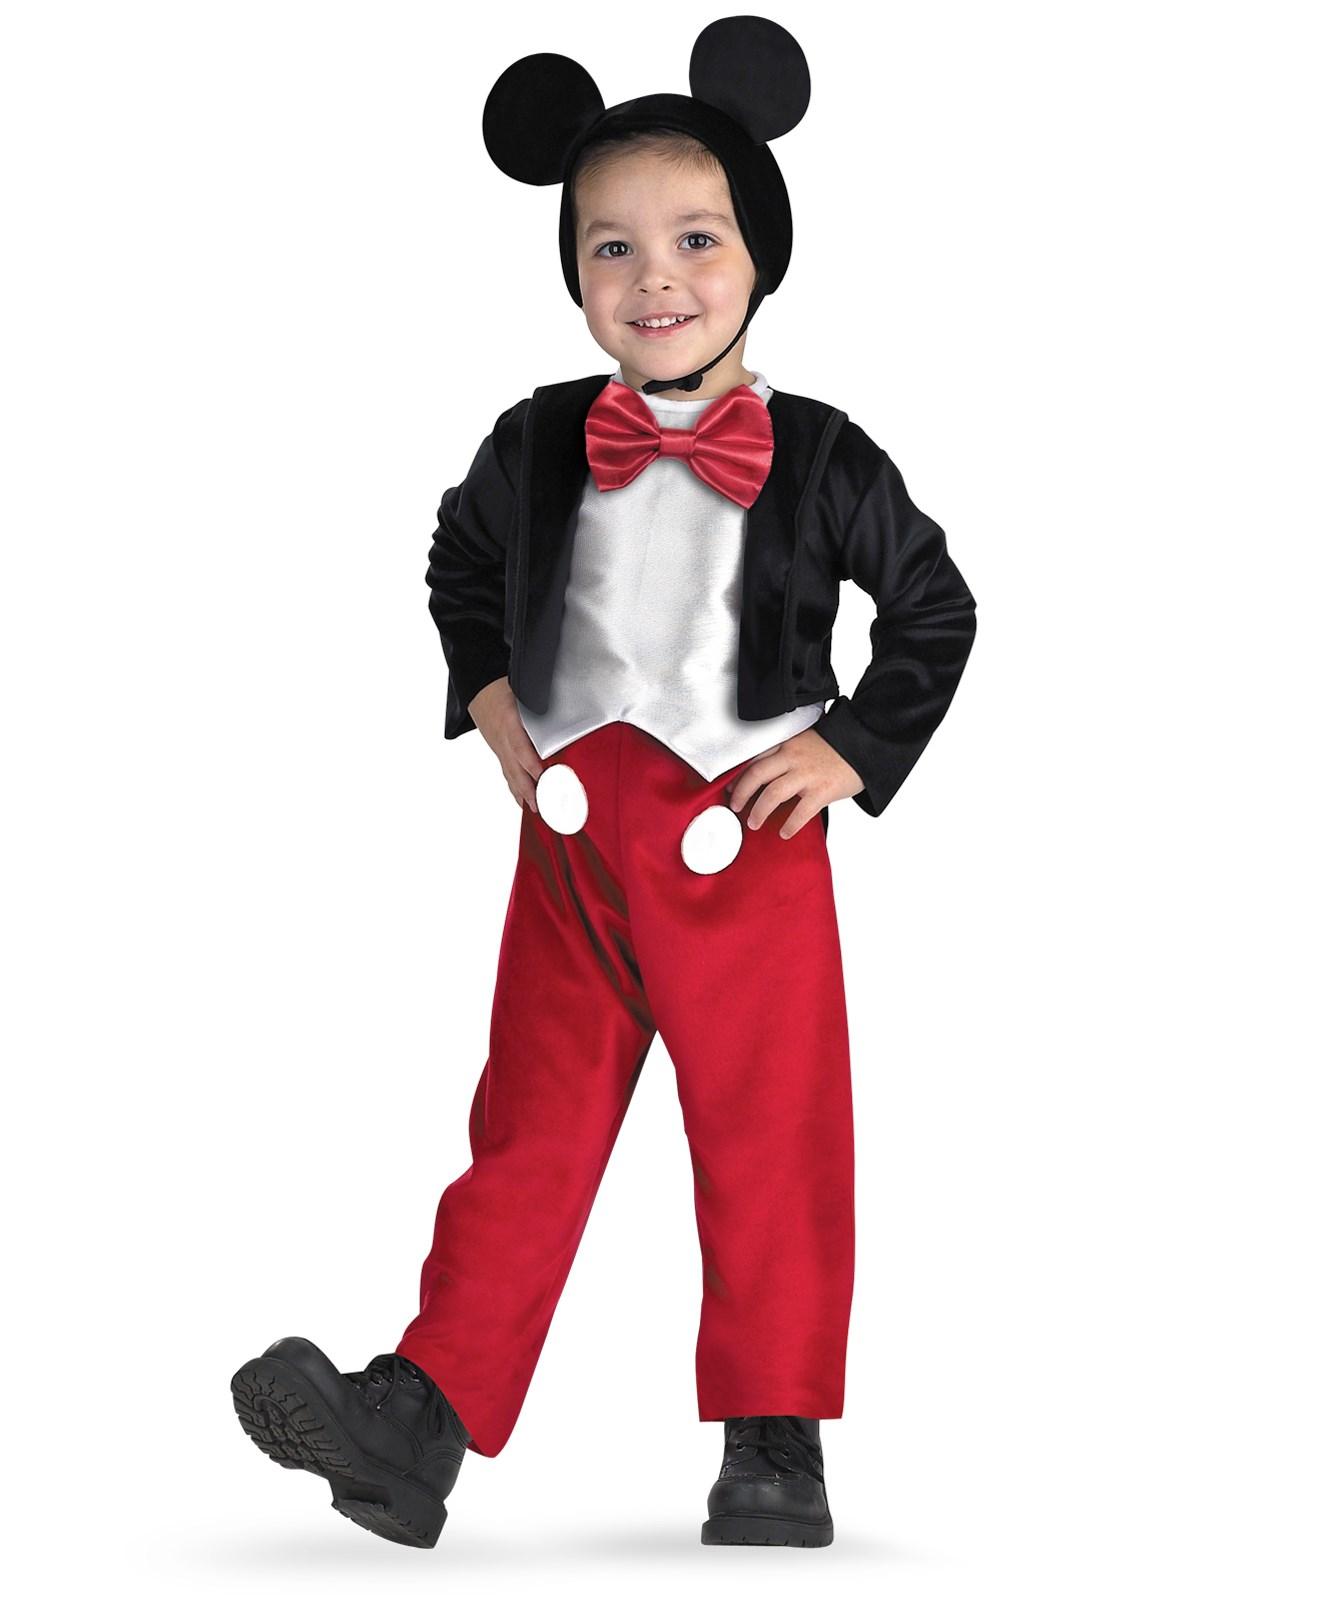 Toddler Halloween Costumes   BuyCostumes.com